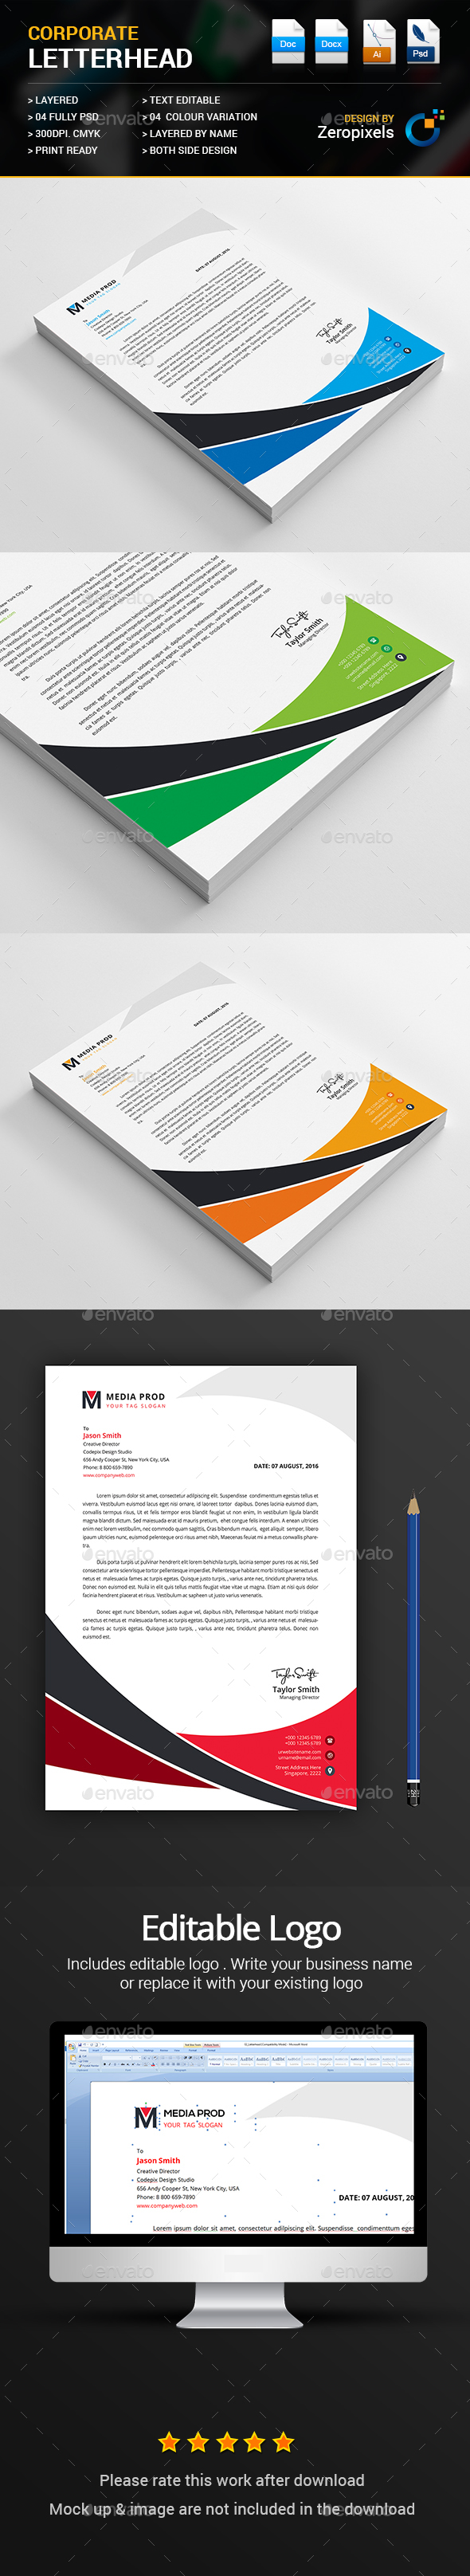 Business letterhead template psd vector eps ai ms word business letterhead by zeropixels spiritdancerdesigns Gallery